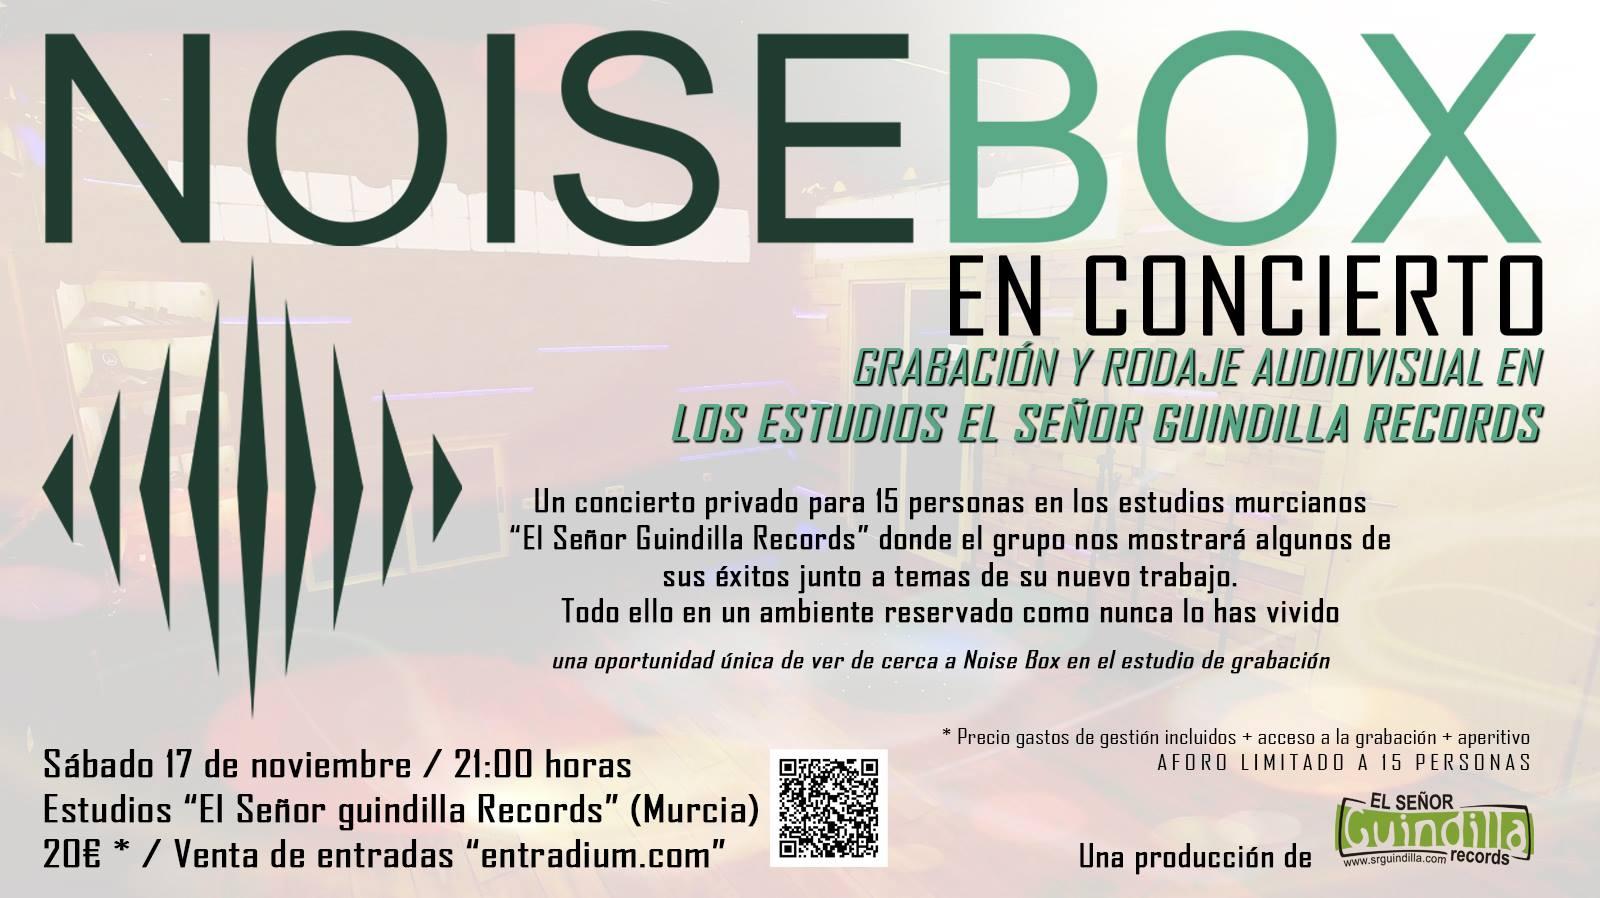 Noise Box - El Señor Guindilla Records